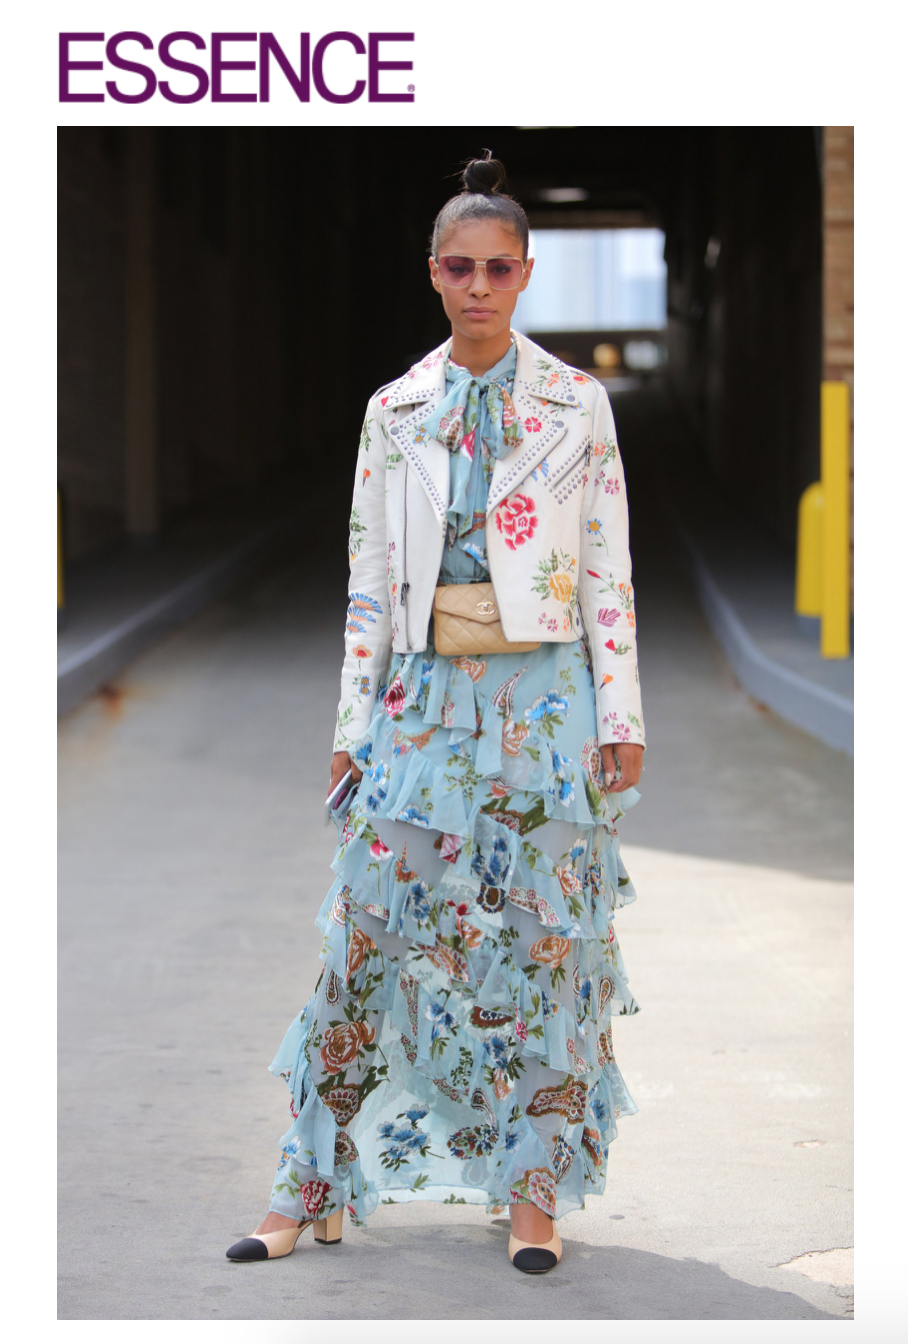 Claire Leana Millar NYFW Street Style SS18